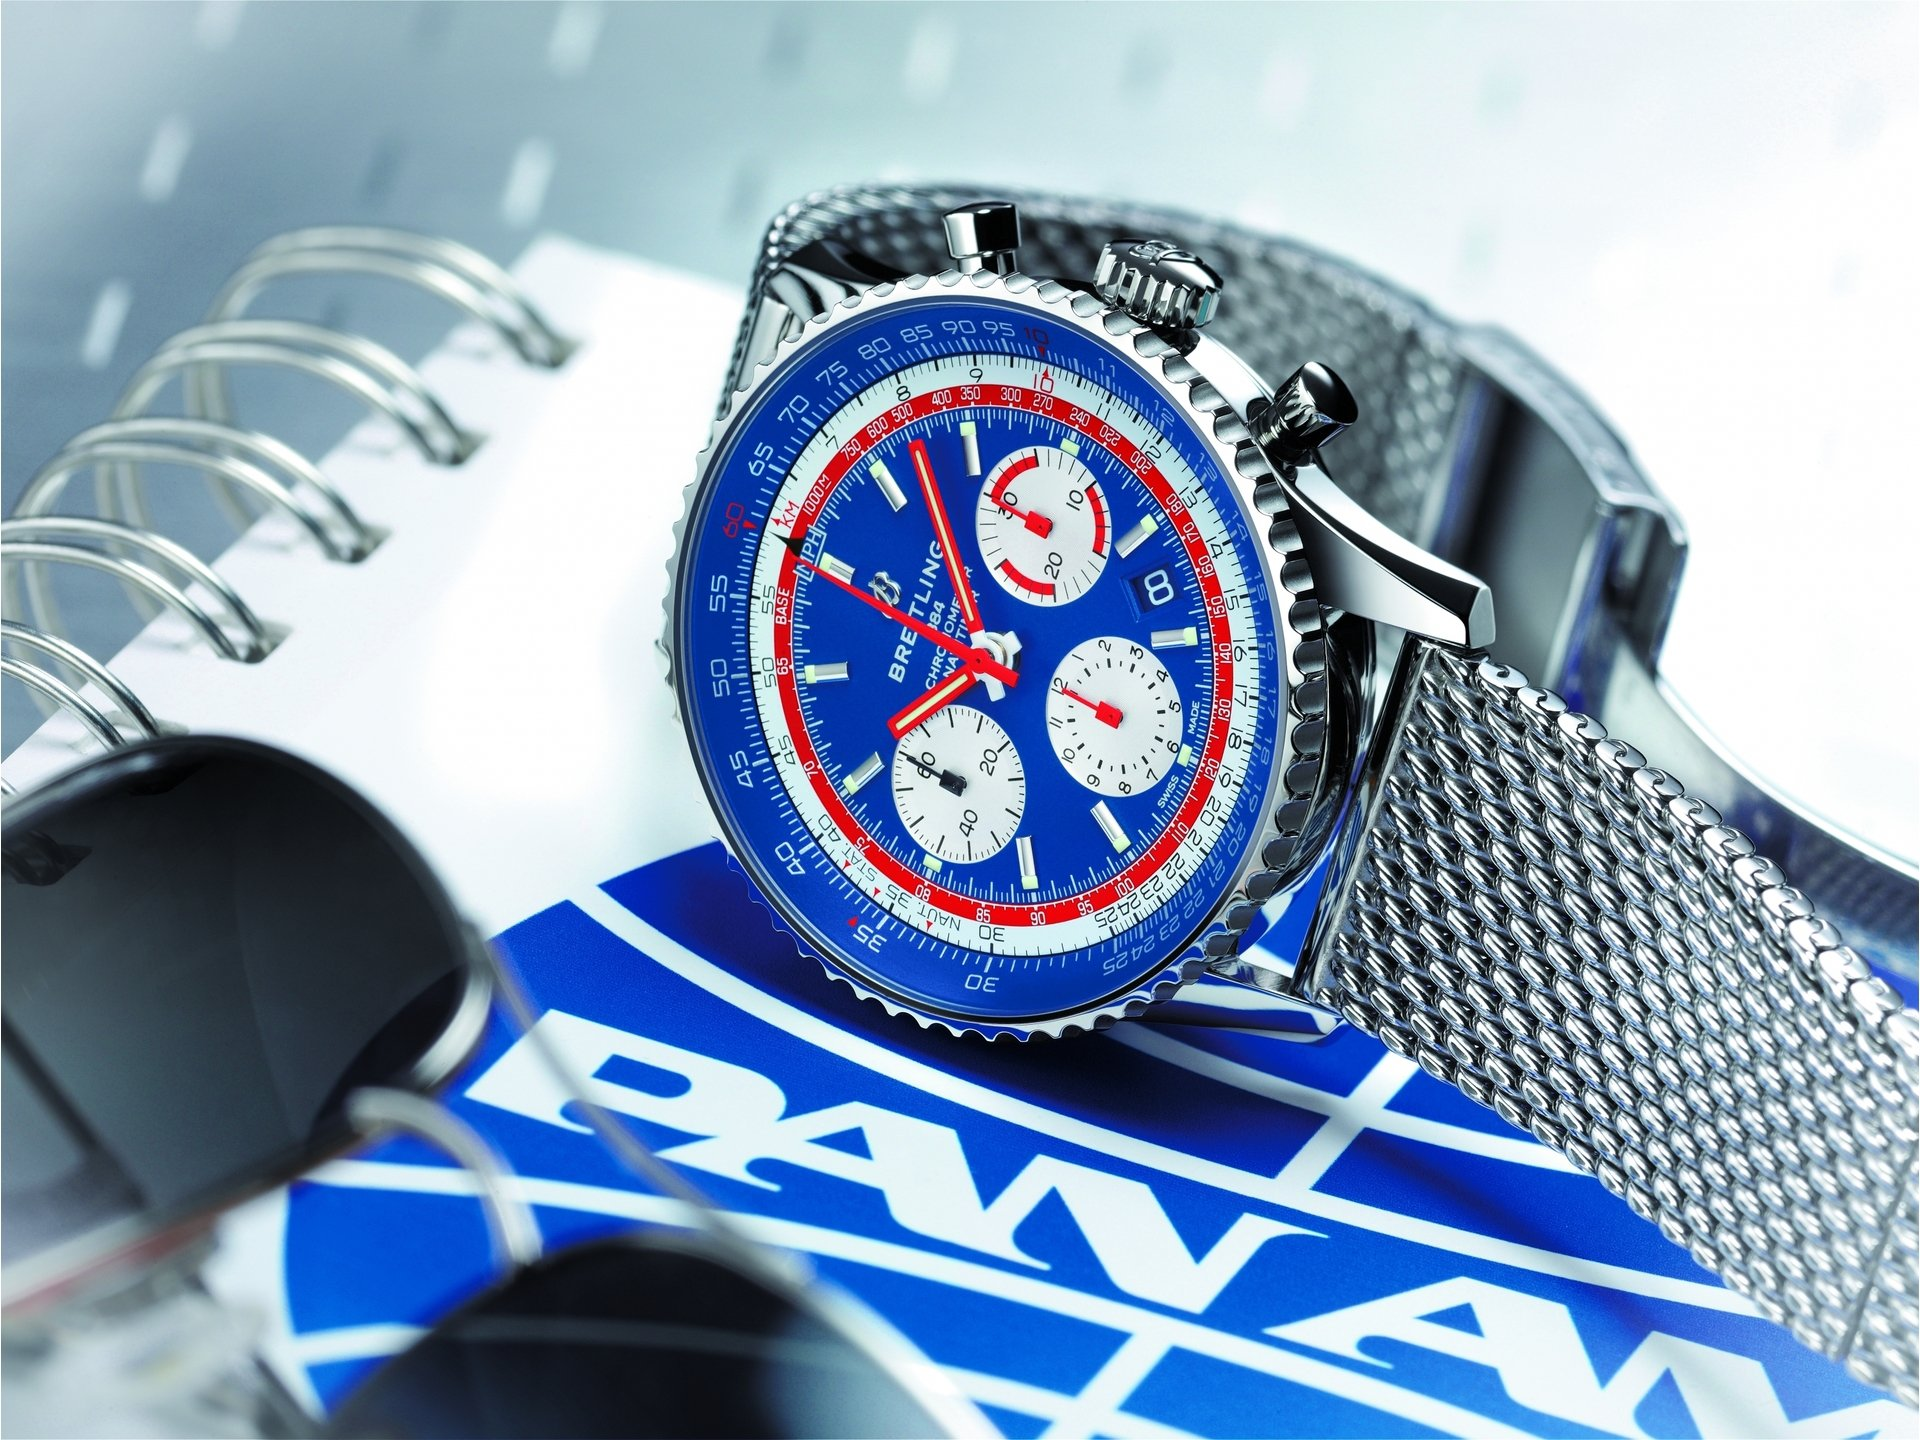 Replica Franck Muller Watches